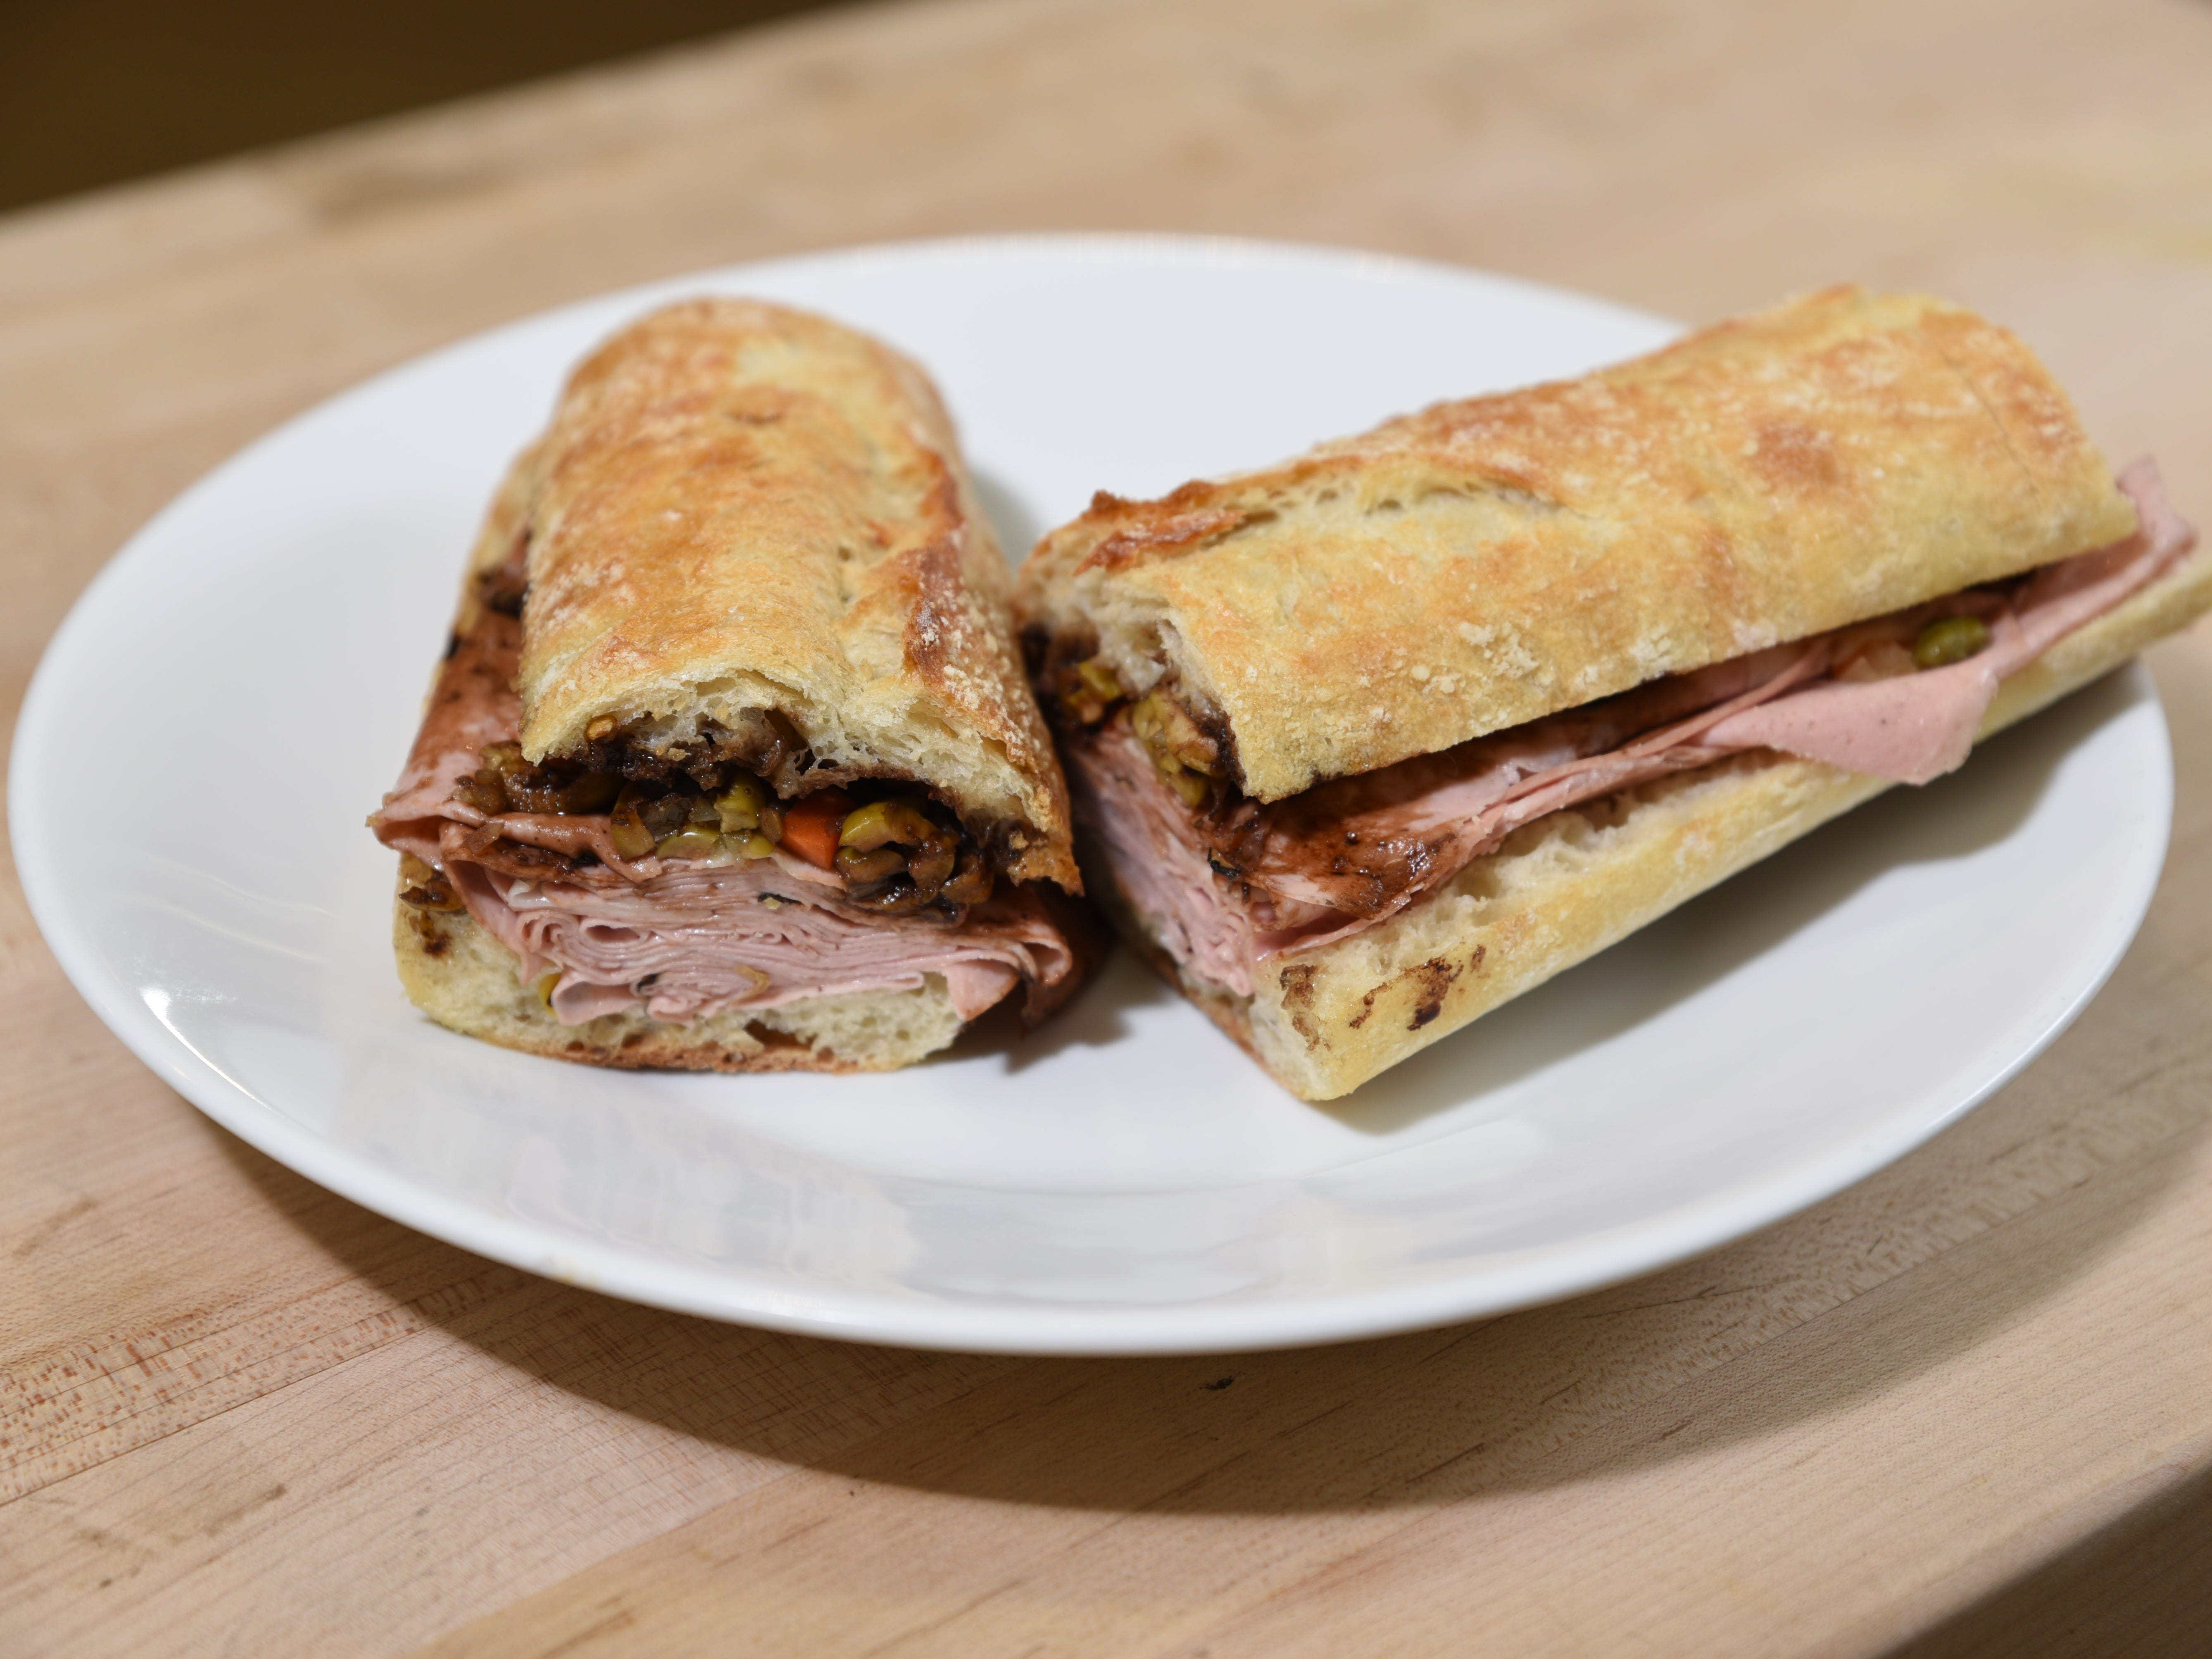 The Italian Stallion sandwich at Super Cellars in Ridgewood